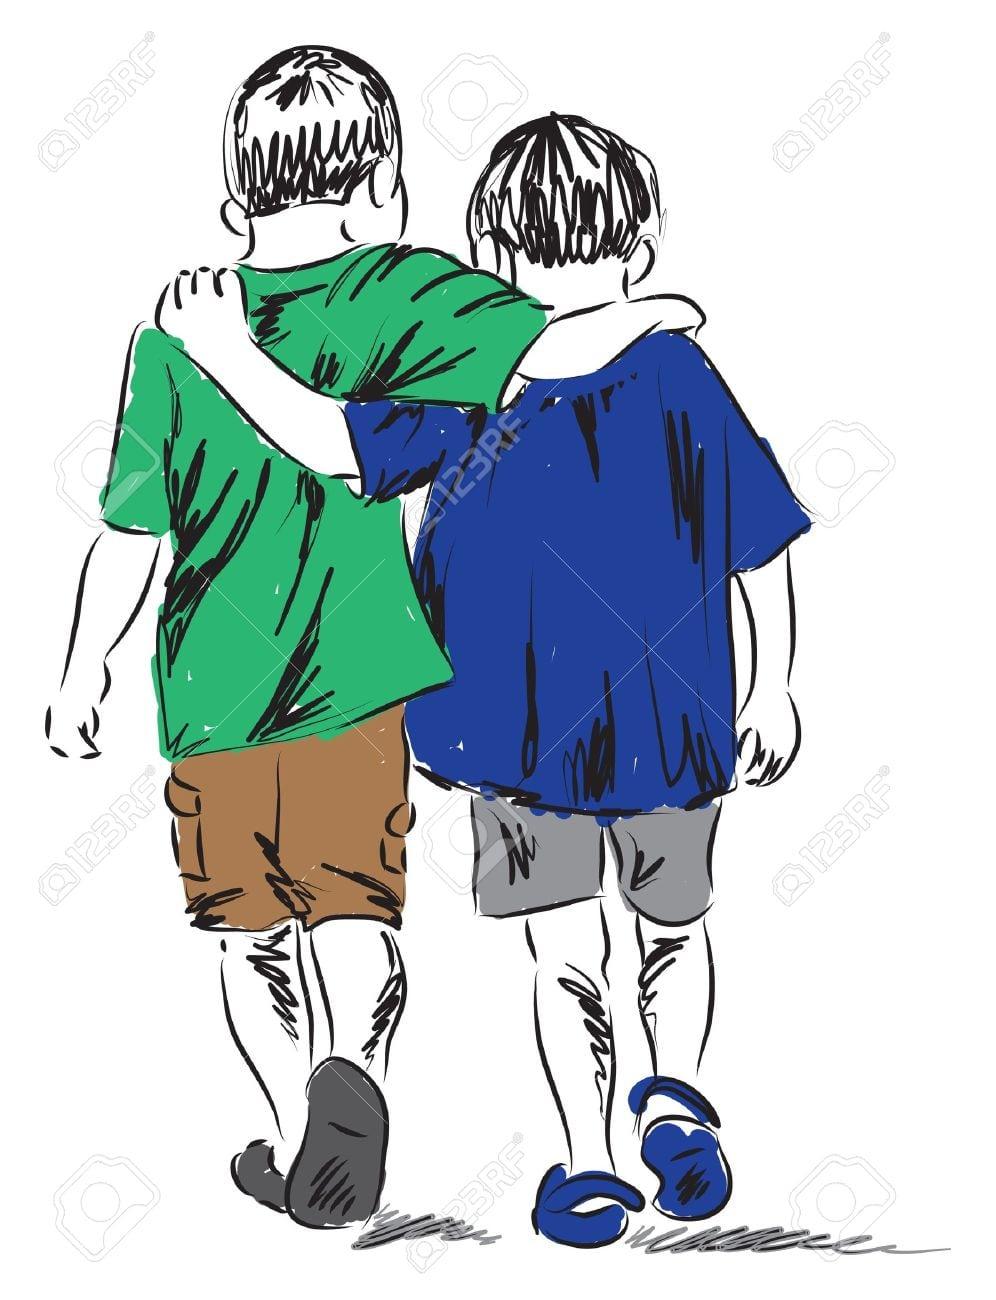 Amigos Dois Garotos Caminhando Juntos Ilustra Royalty Free